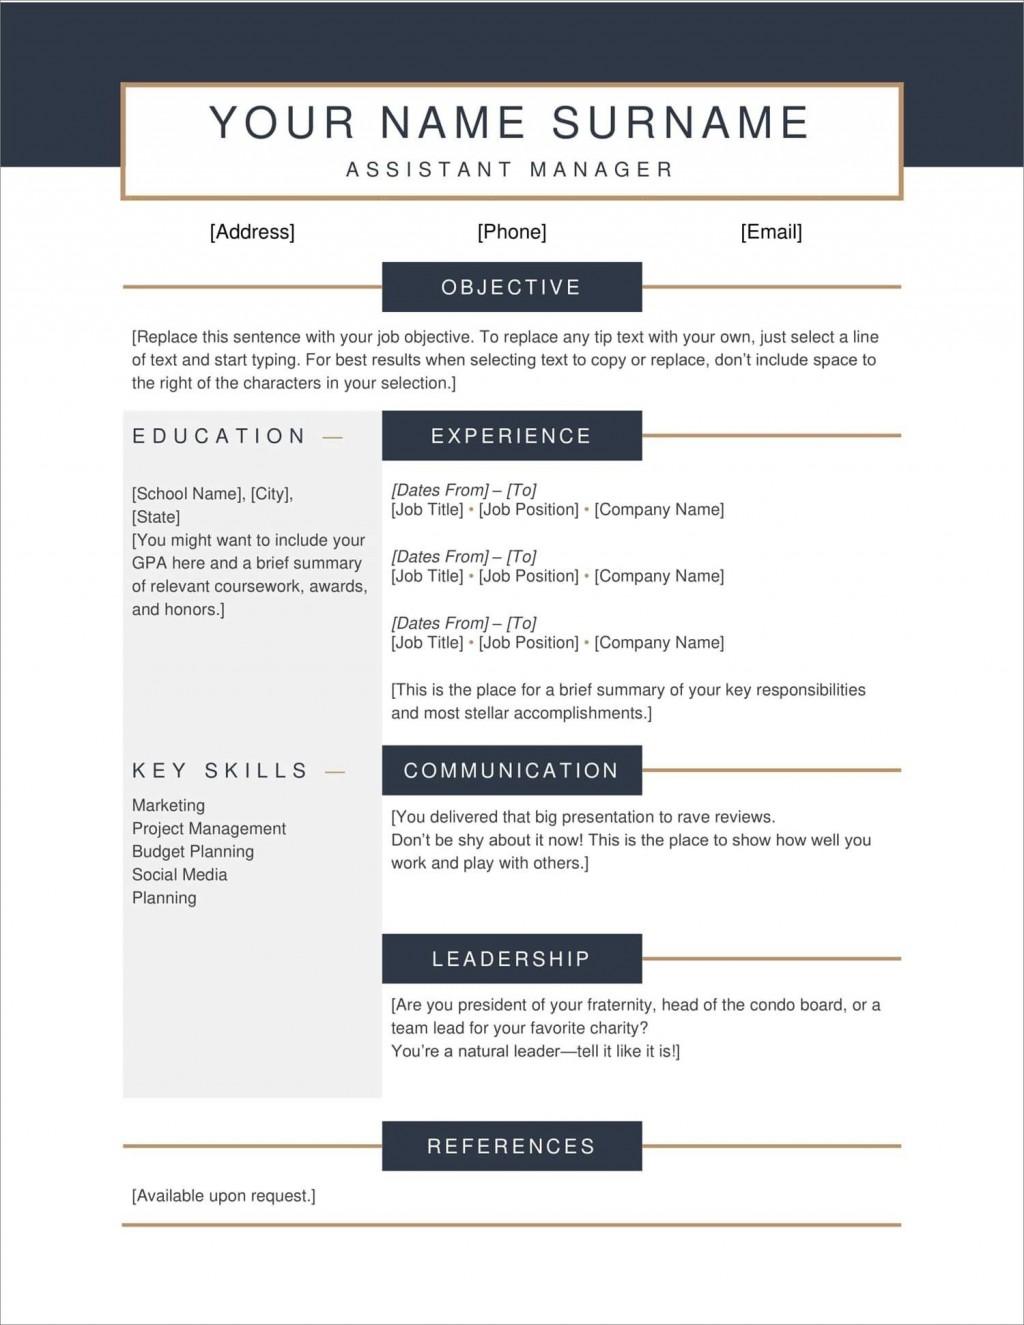 005 Imposing Free Printable Resume Template Download Image Large